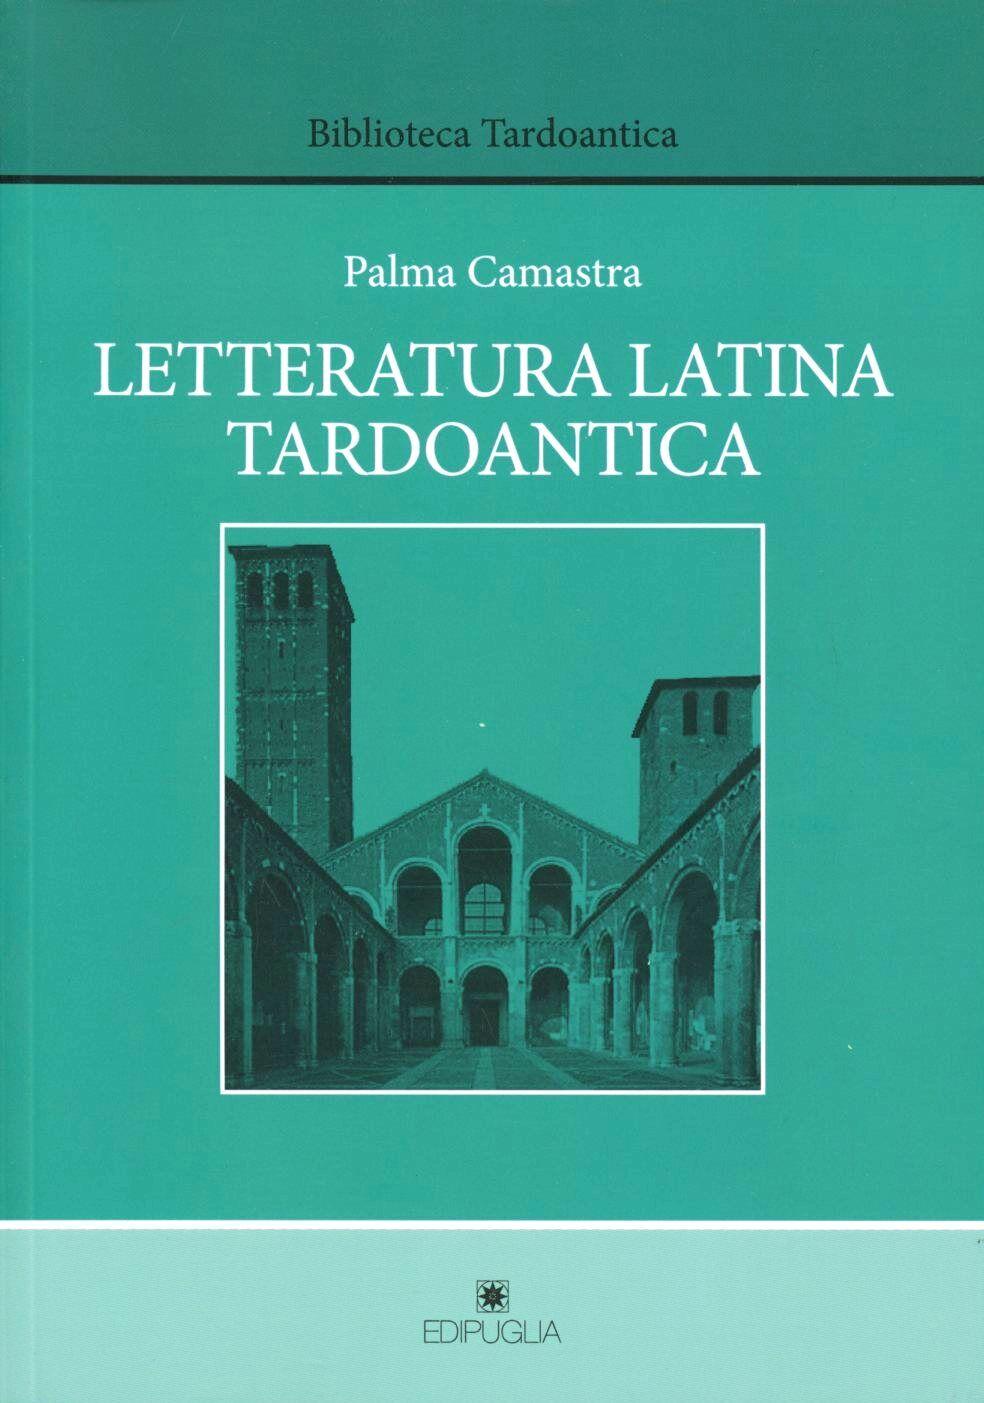 Letteratura latina tardoantica